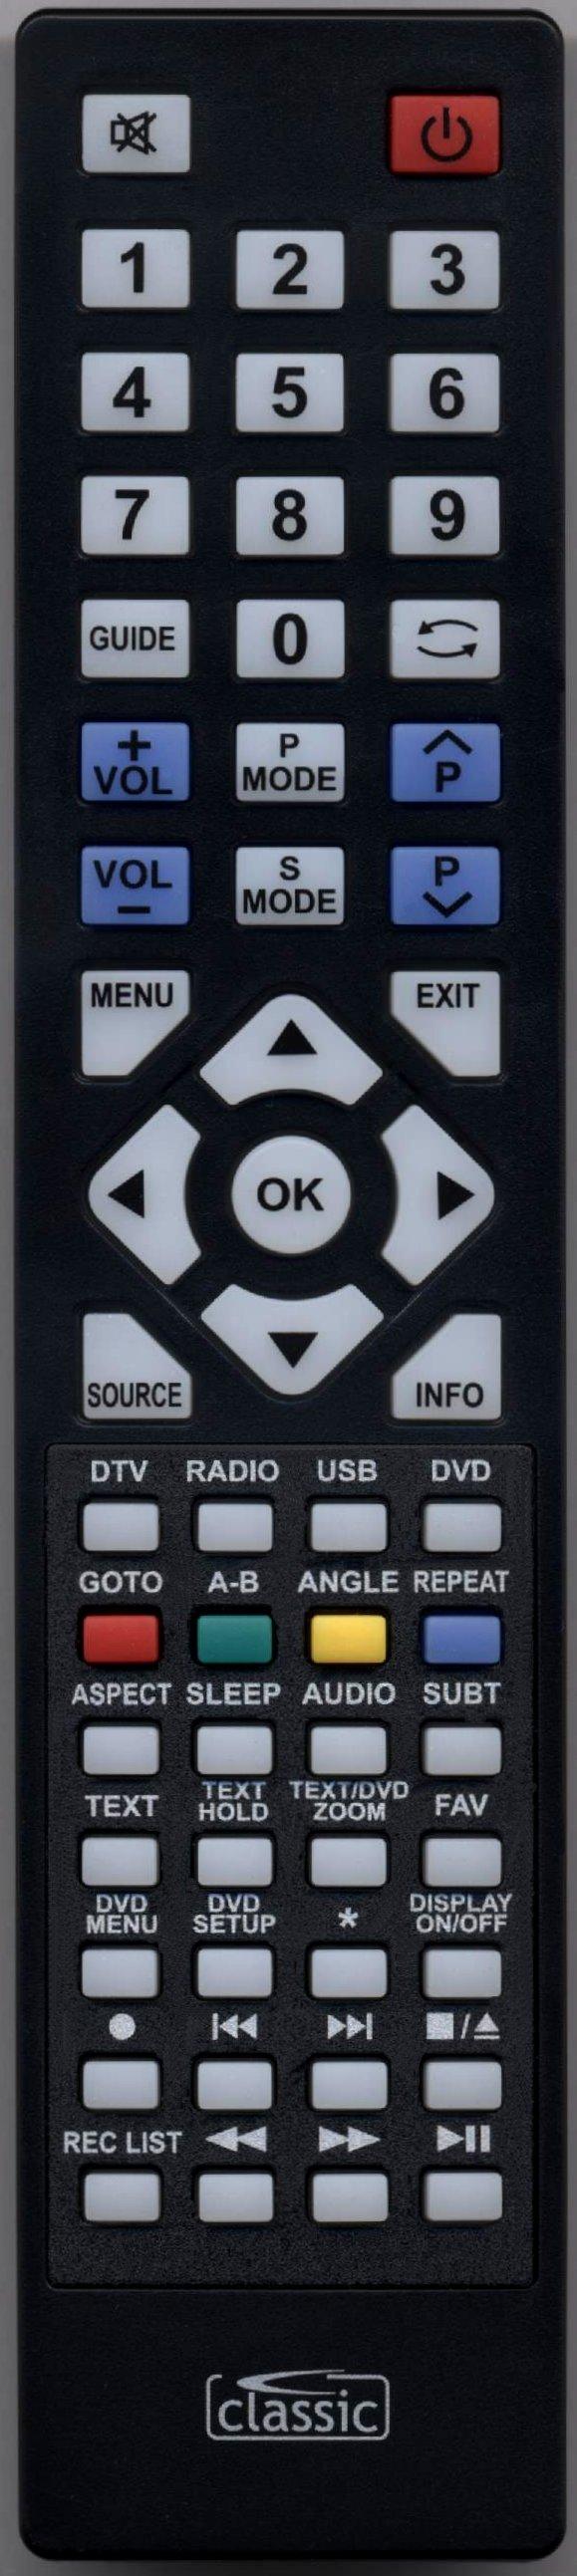 Blaupunkt 32-1480 Remote Control